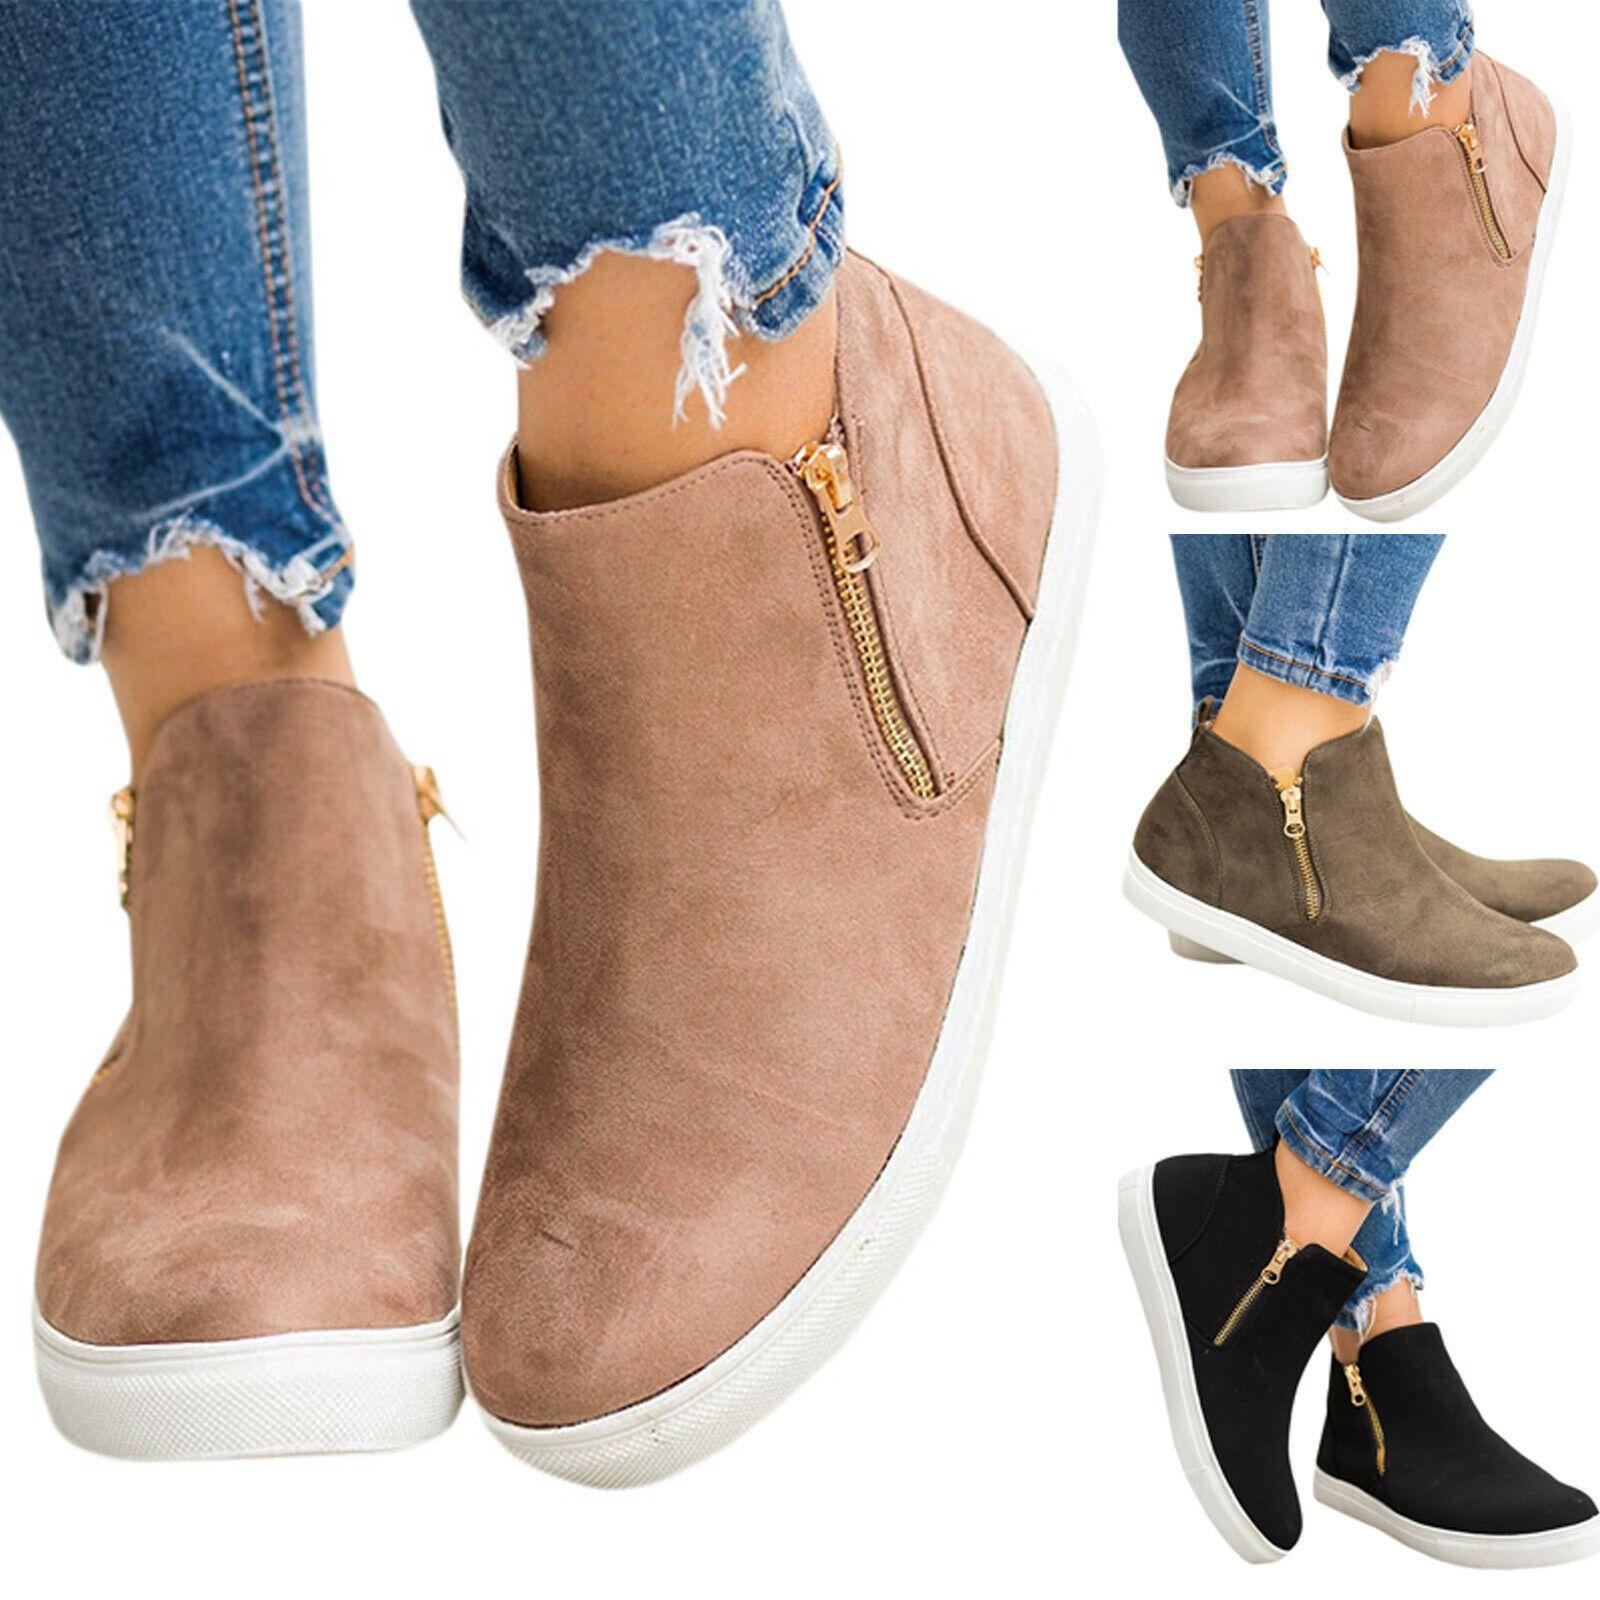 Ladies Sneakers Women Zip Ankle Boots